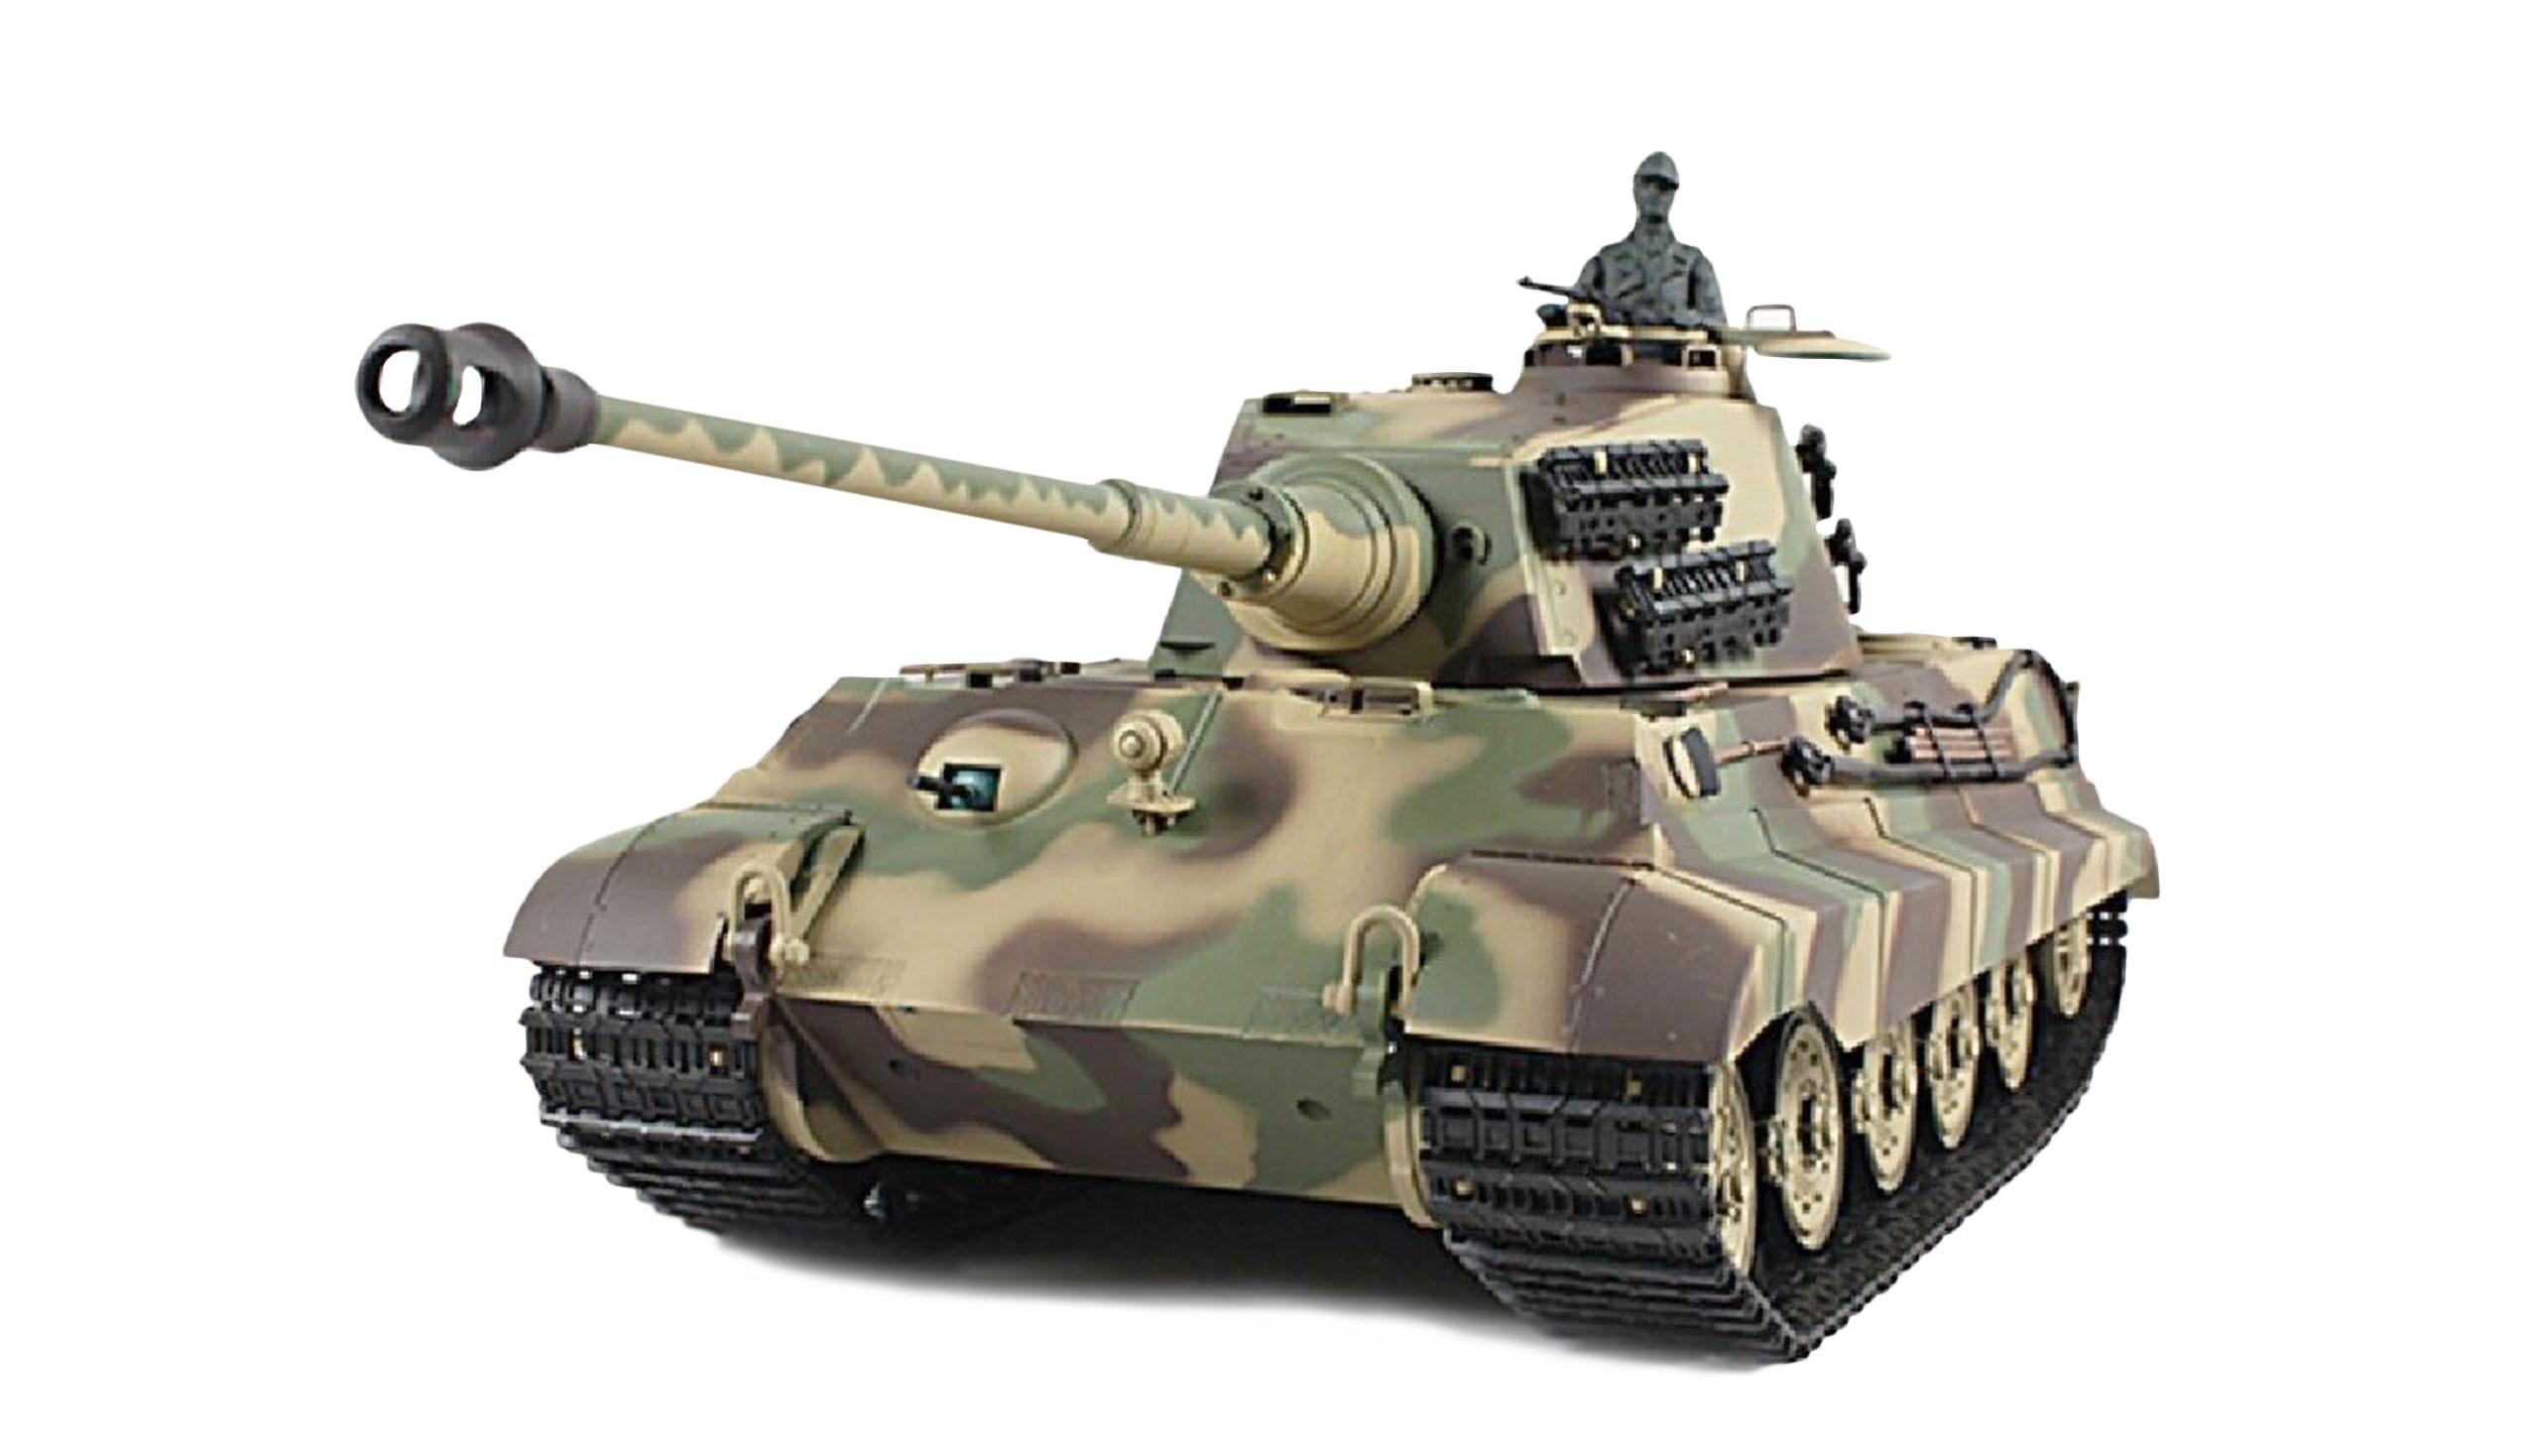 Amewi 23072 - Funkgesteuerter (RC) Panzer - Elektromotor - 1:16 - Betriebsbereit (RTR) - Camouflage - 2,4 GHz